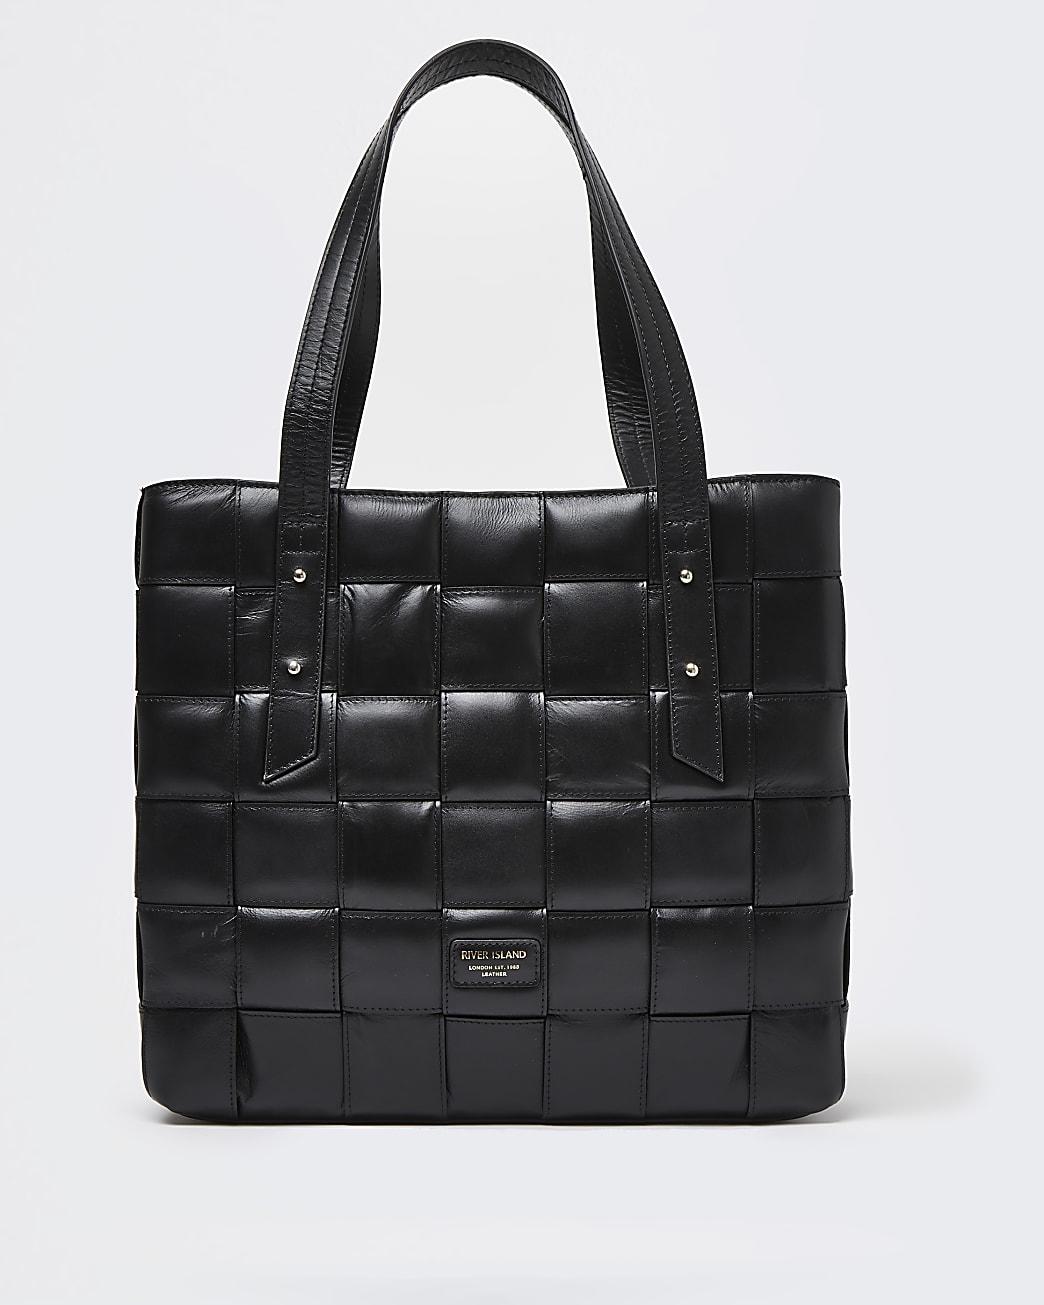 Black woven leather shopper bag